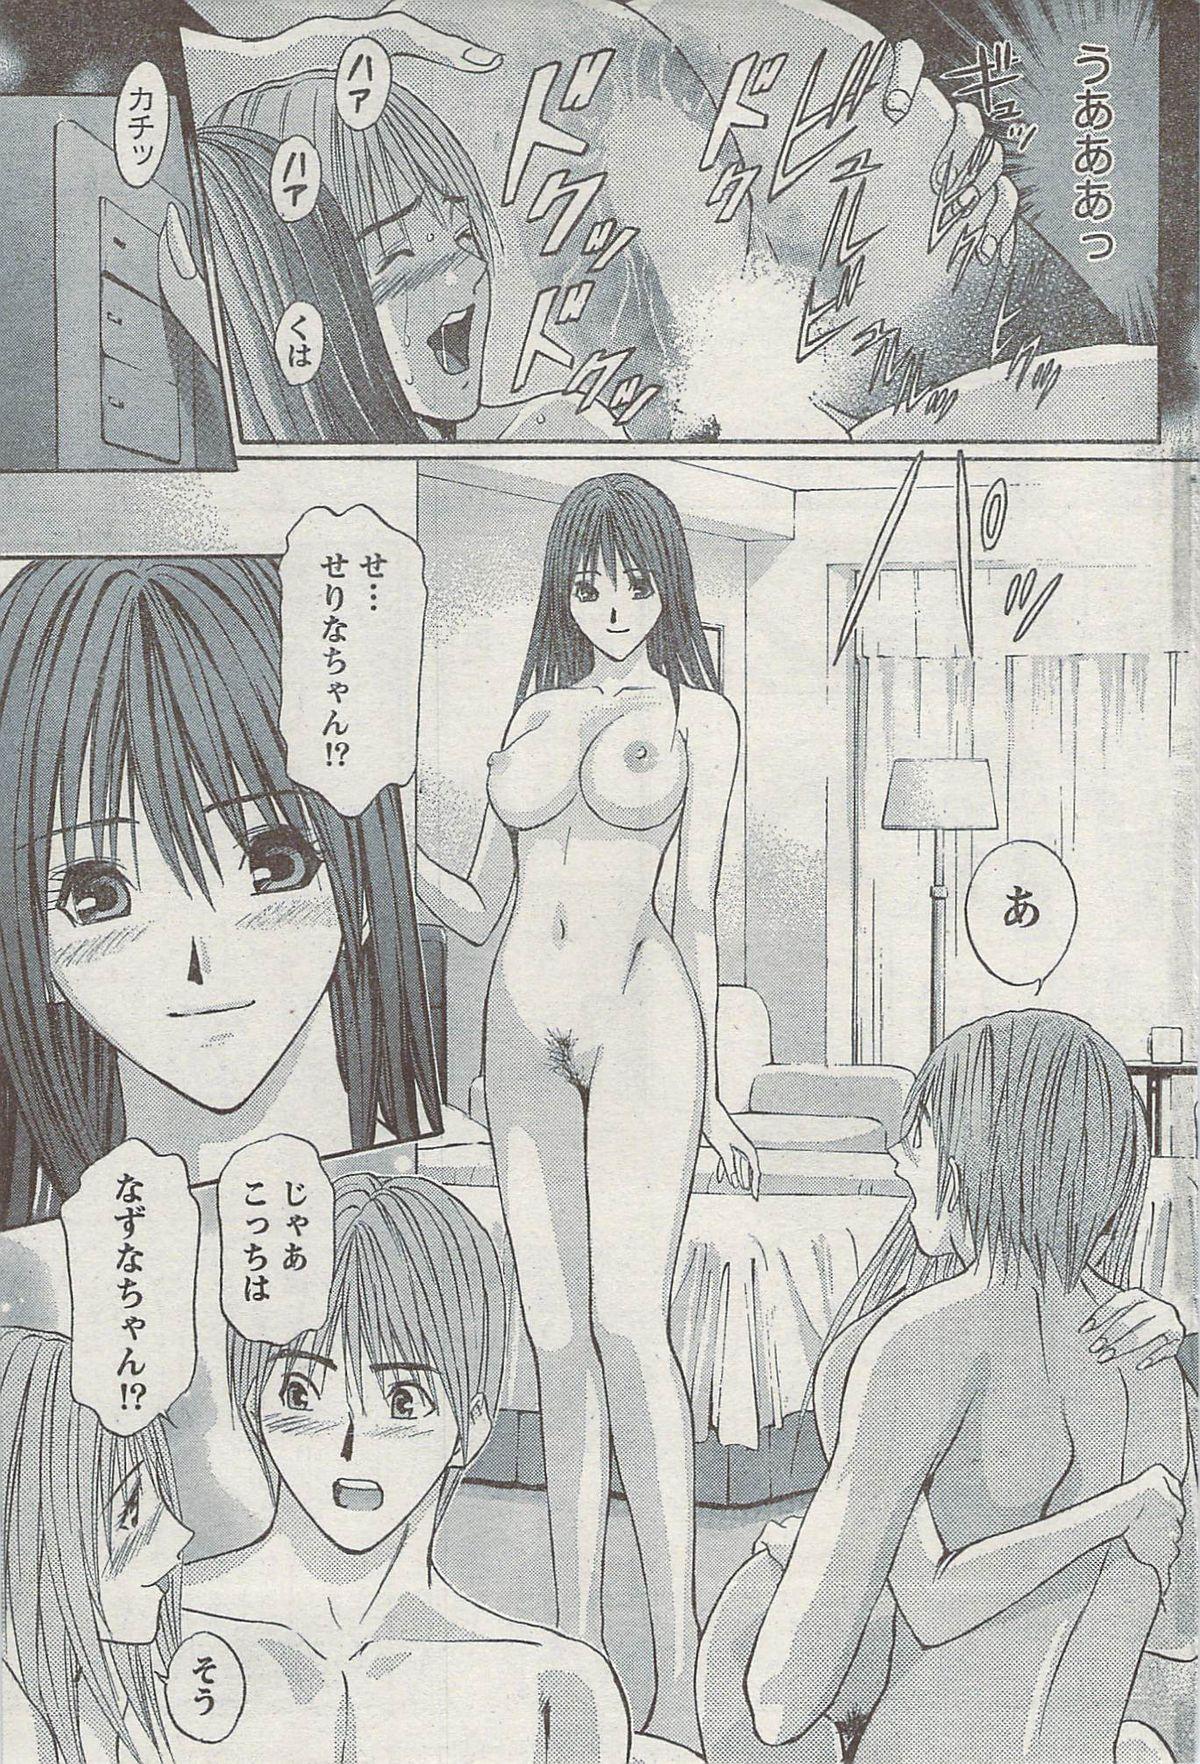 Monthly Vitaman 2007-08 78